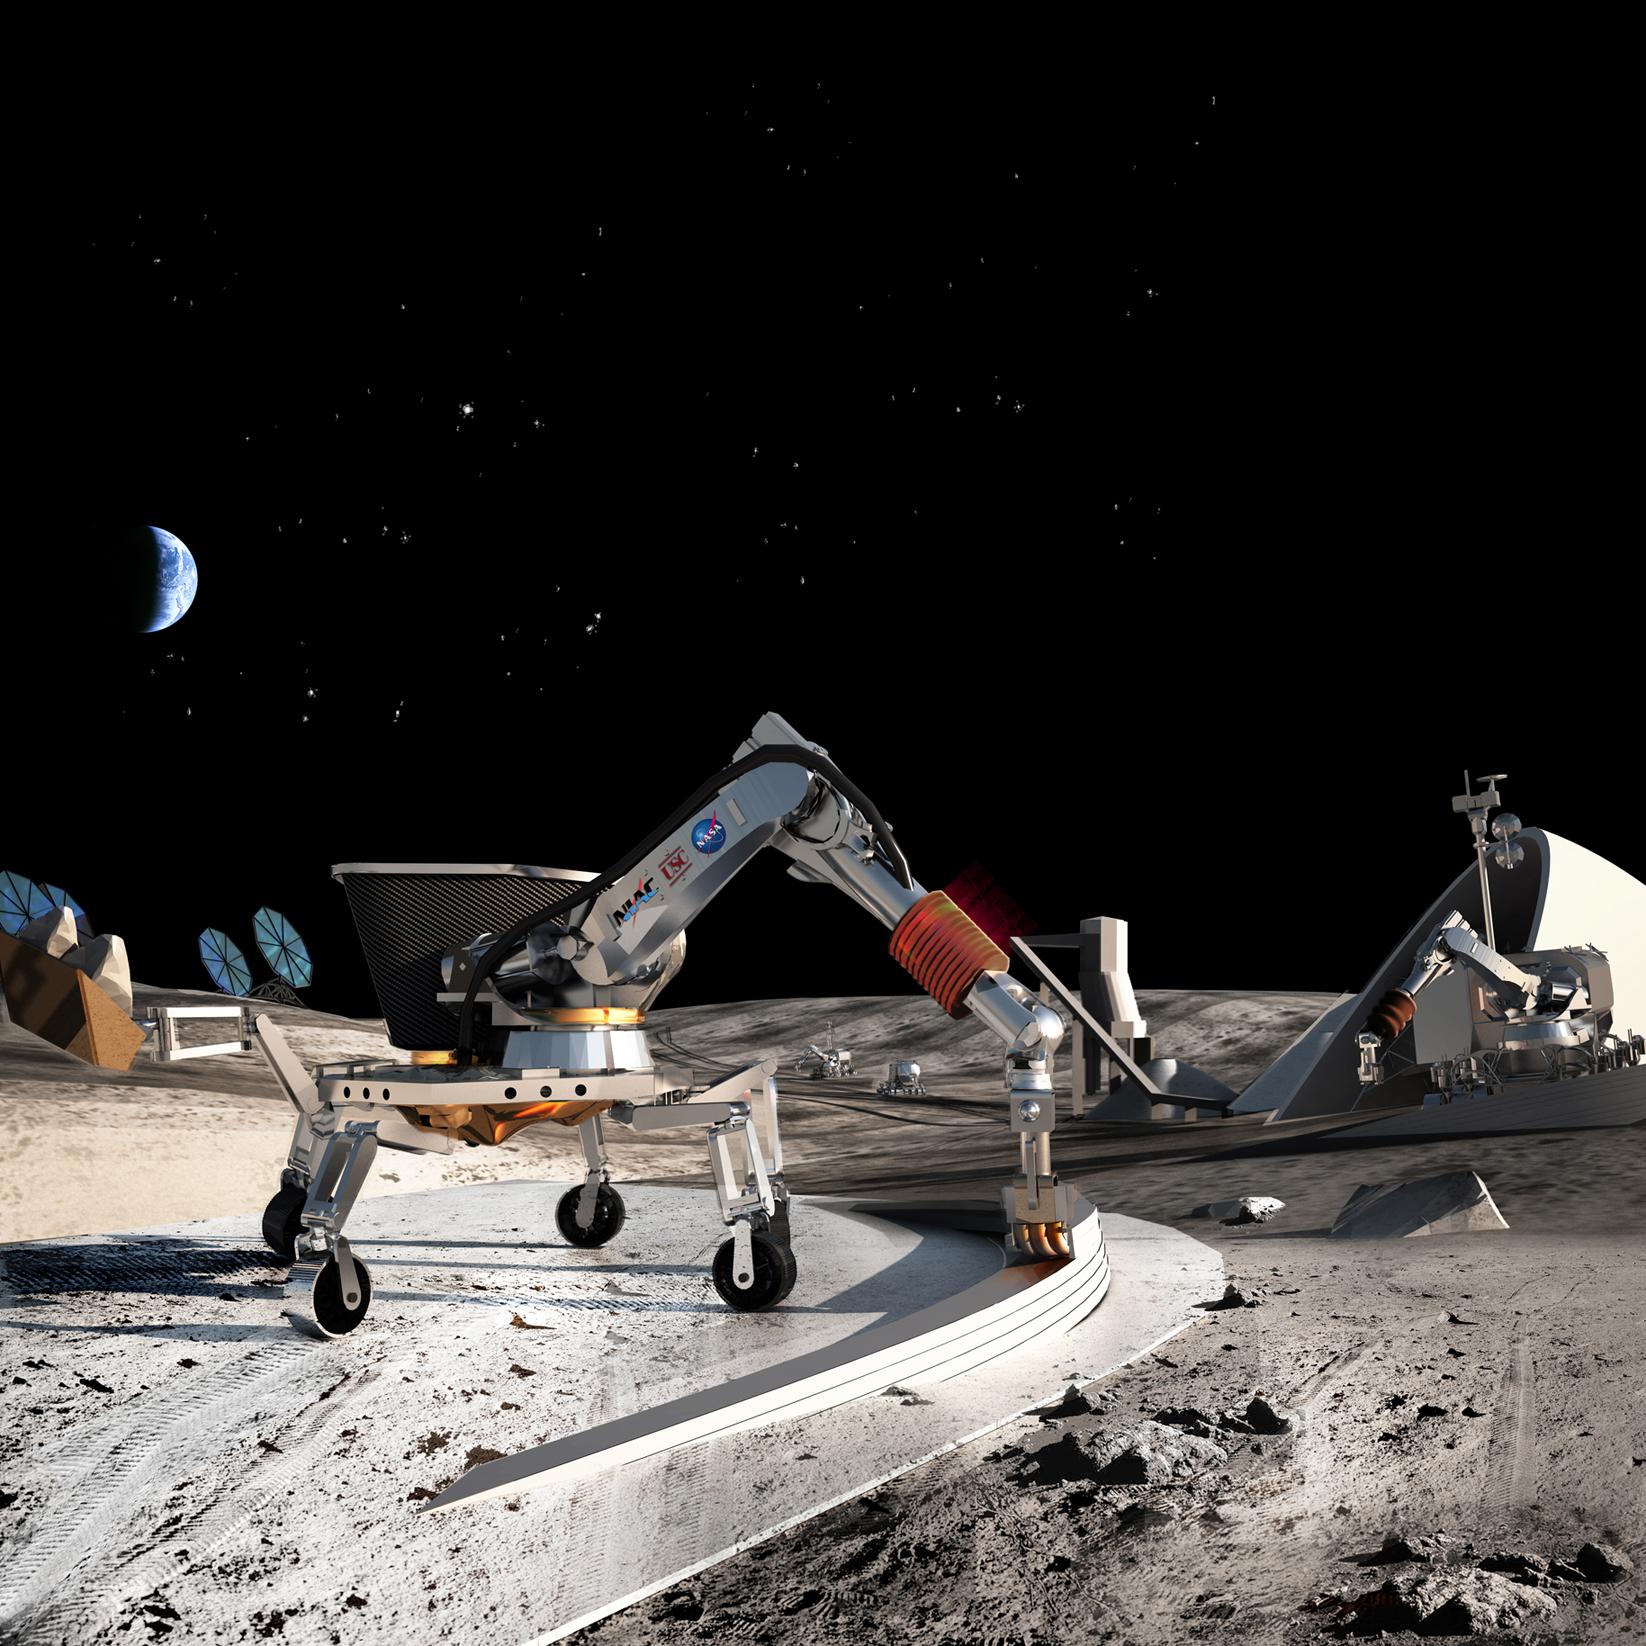 nasa robots on mars - photo #14